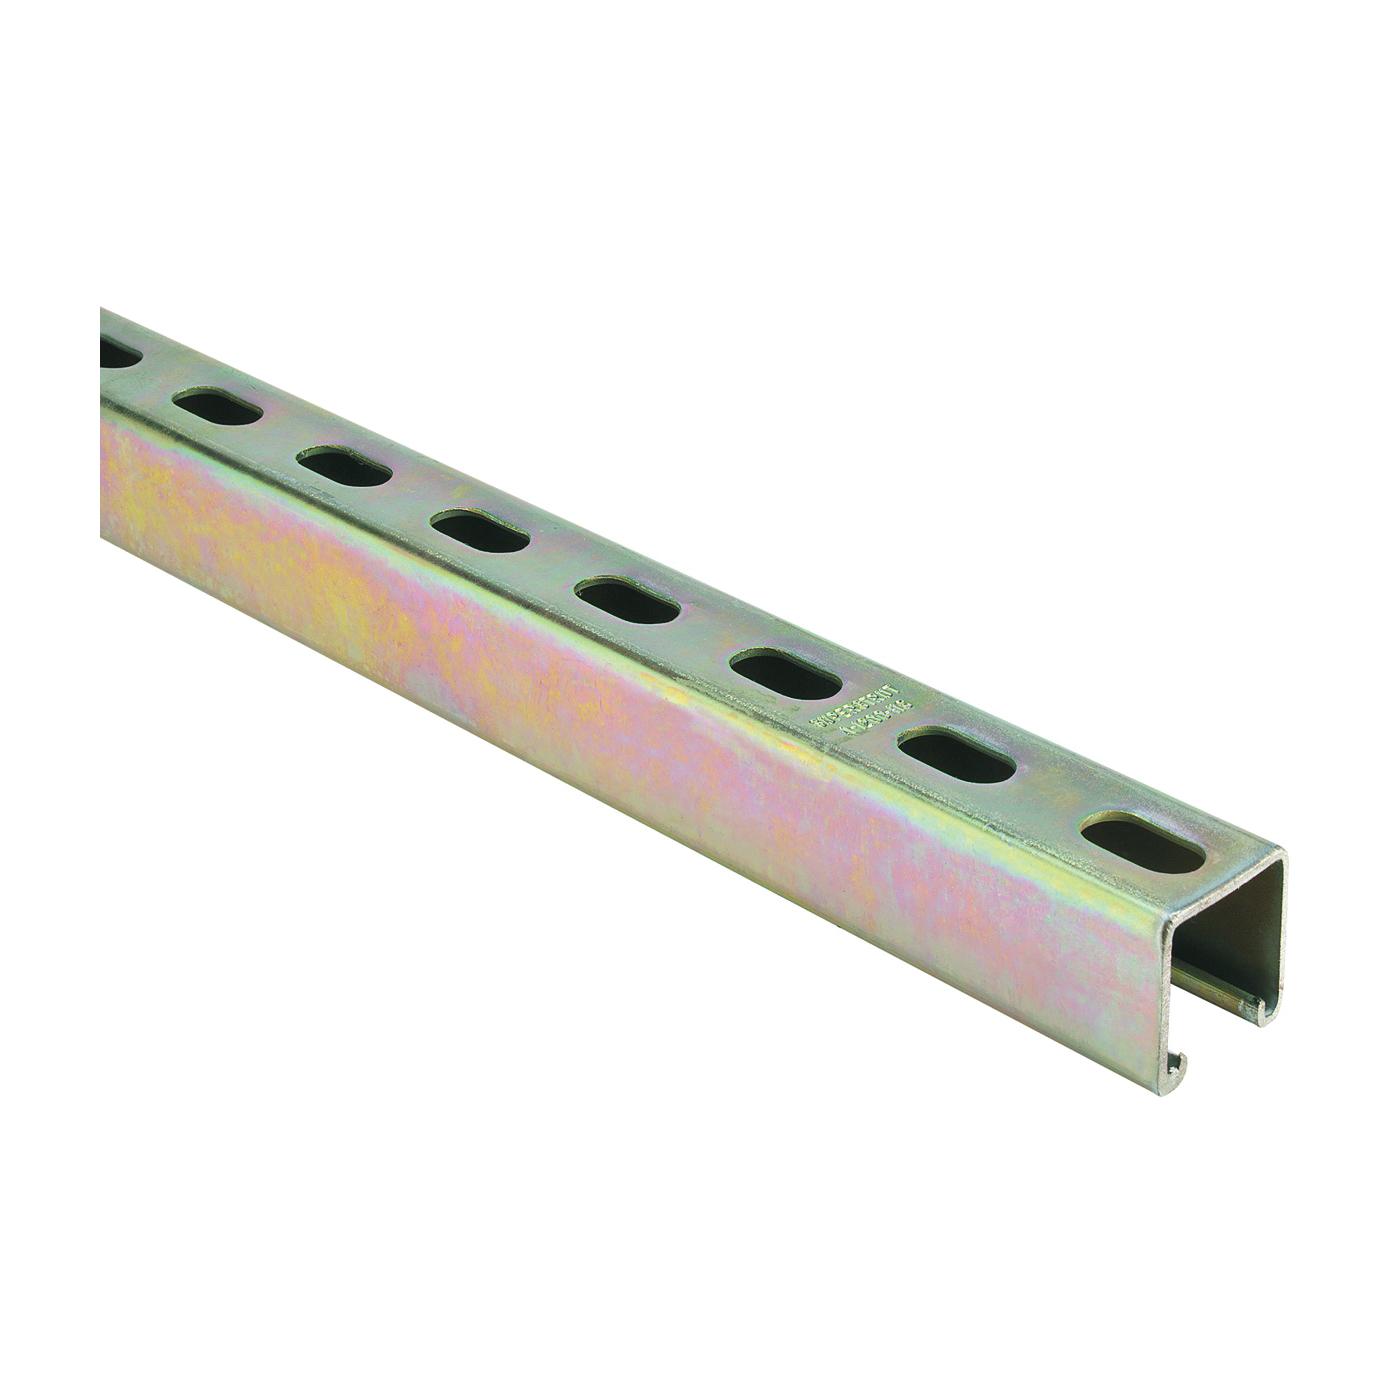 Picture of SuperStrut ZA1200HS 4 Conduit Strut Channel, Steel, Gold, Galvanized